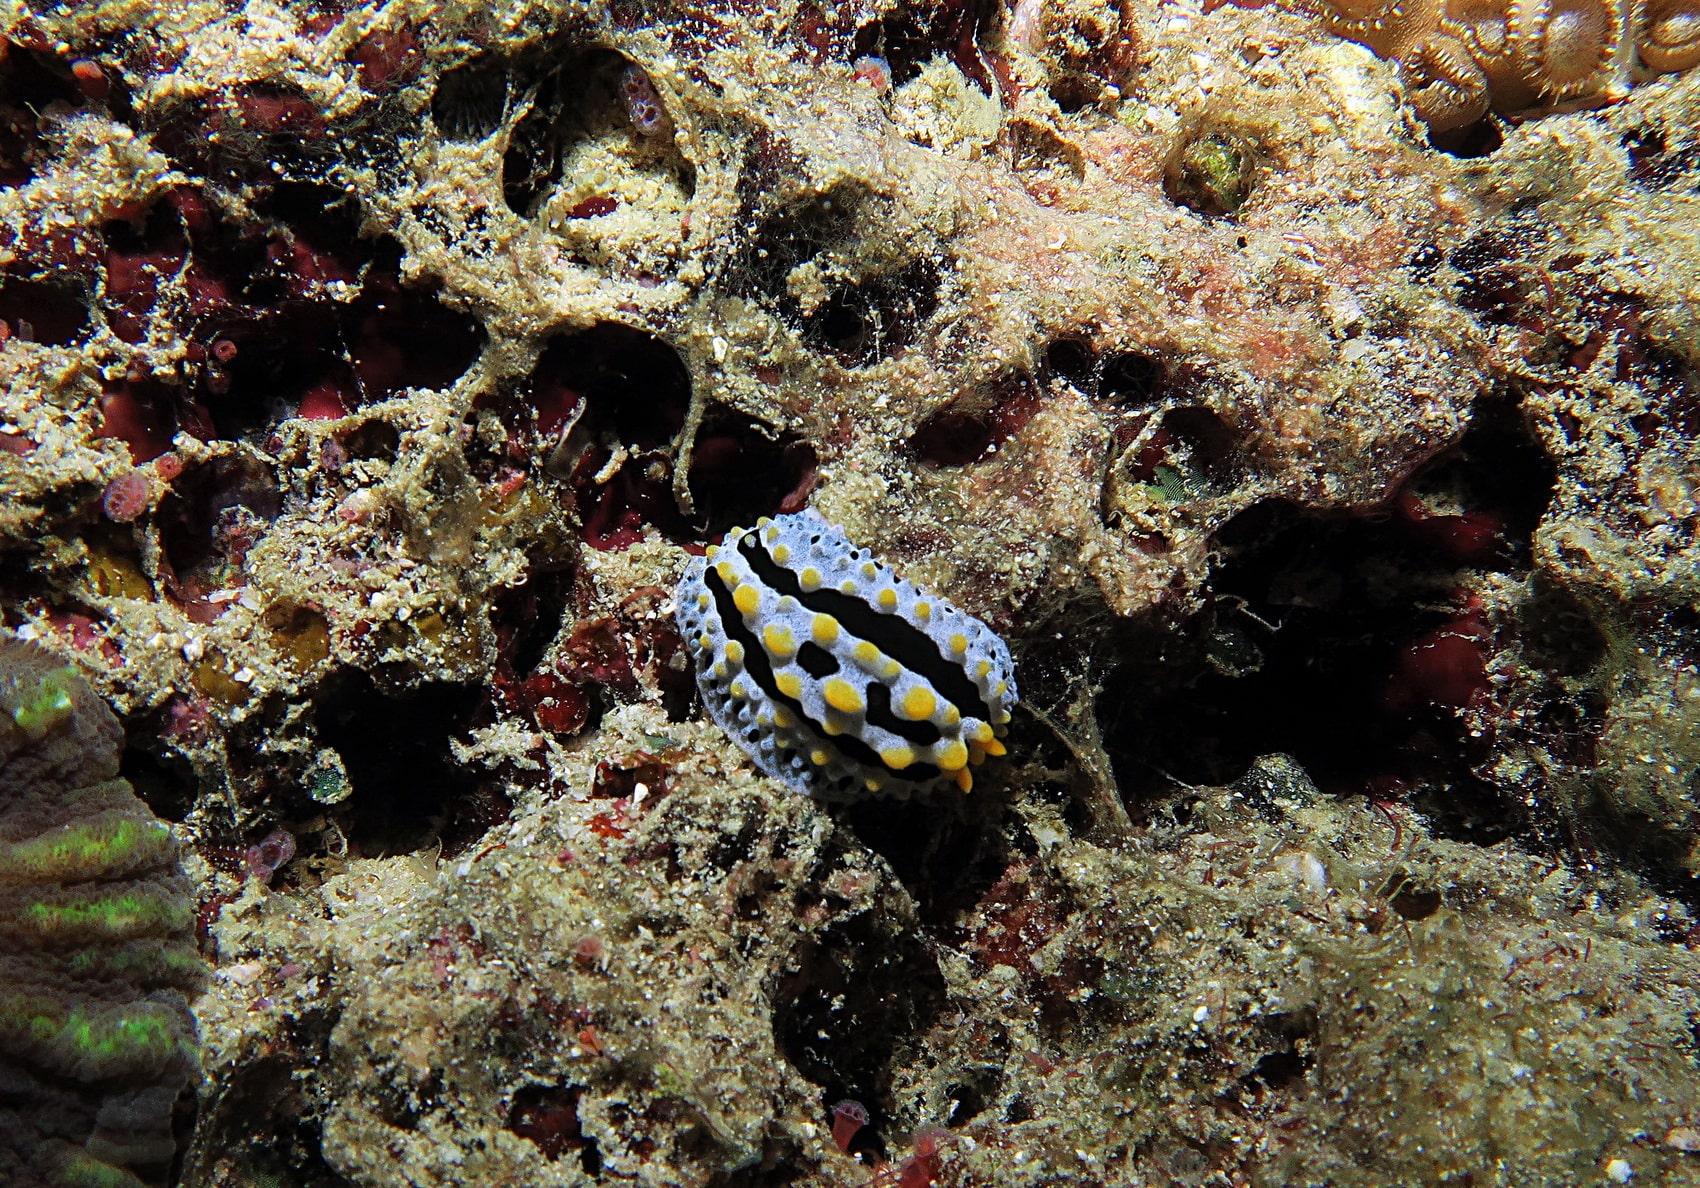 Similan Islands nudibranchs and sea slugs